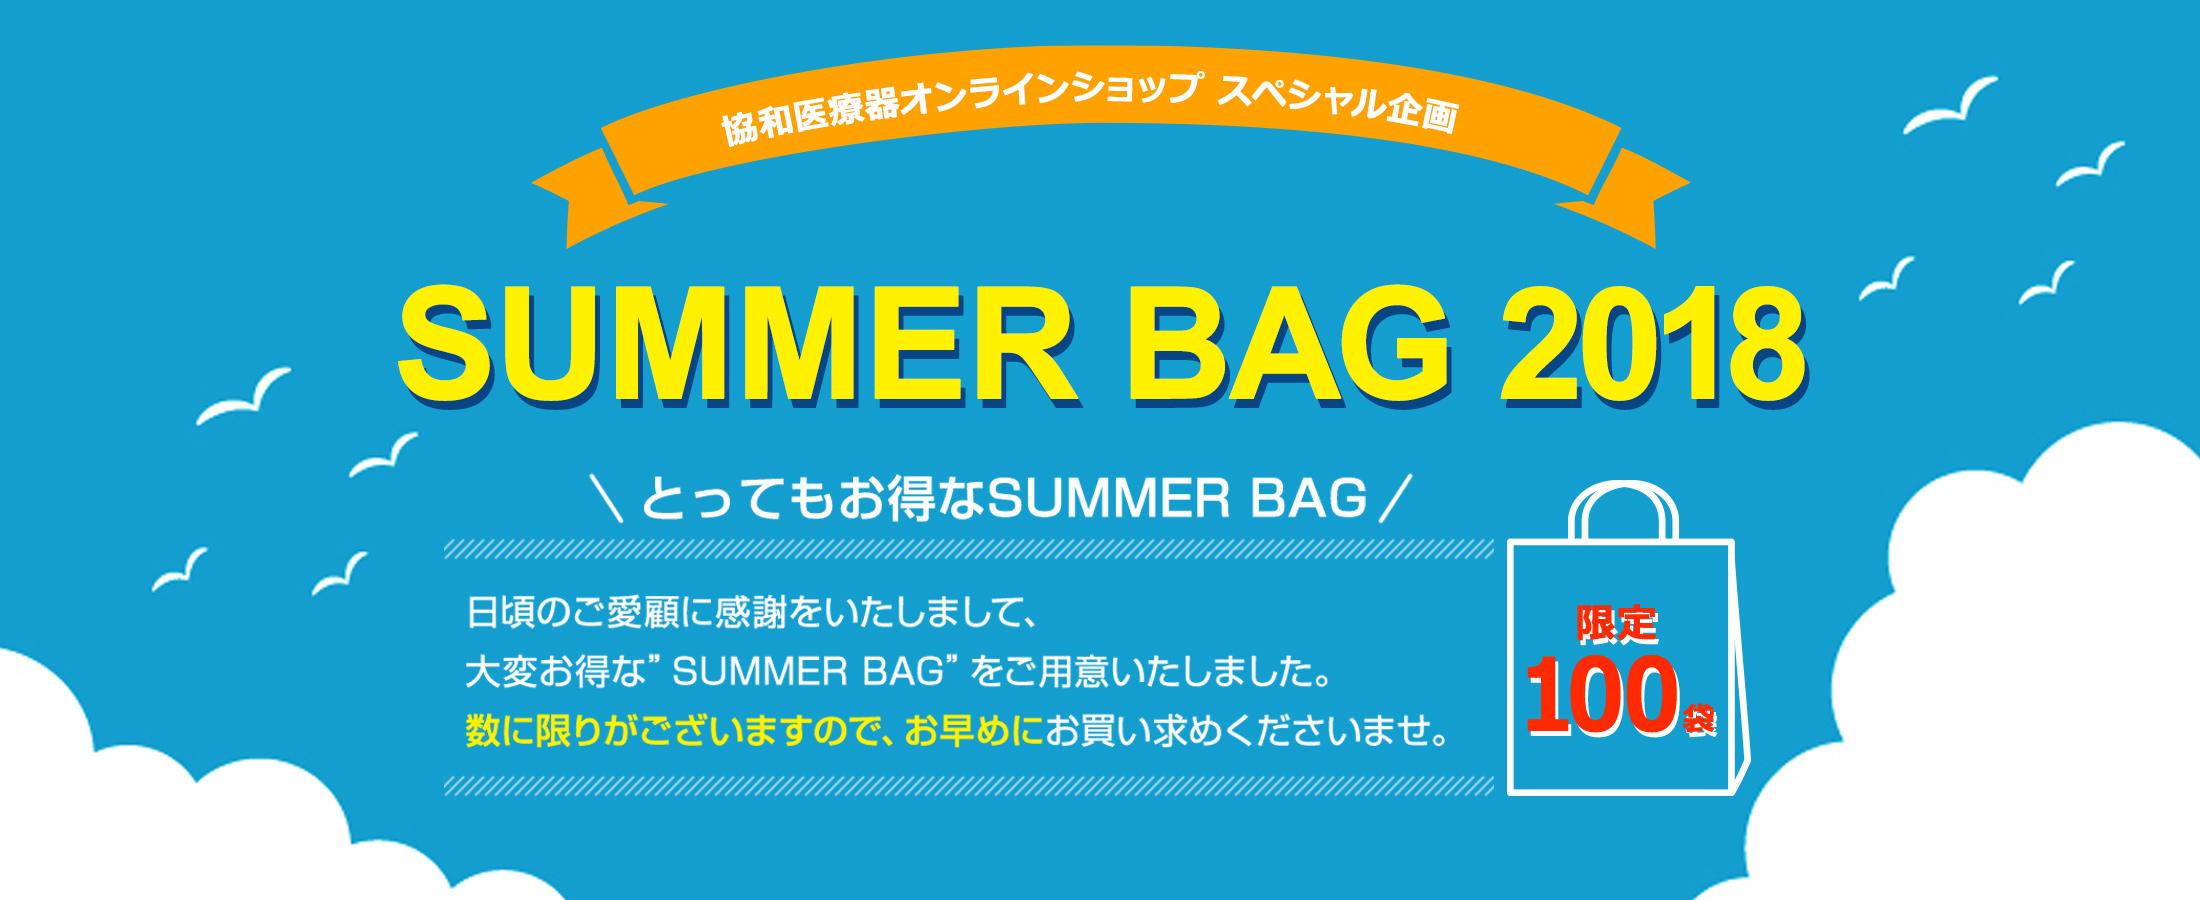 SUMMER BAG 2018